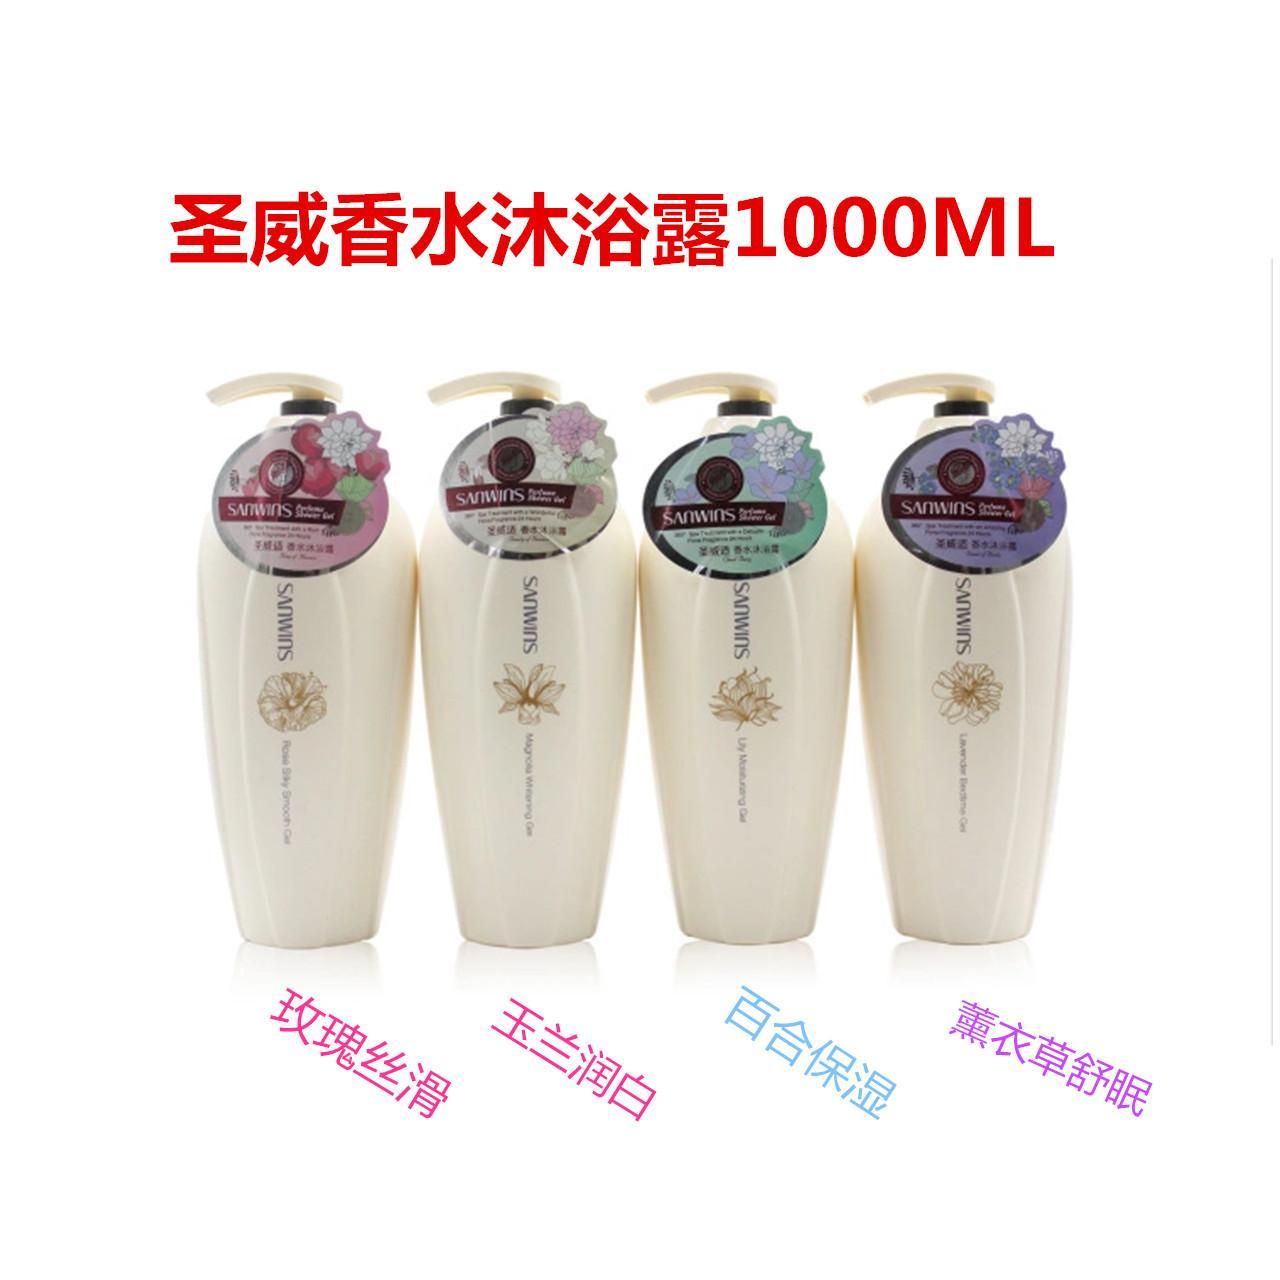 SANWINS香港聖威適香水沐浴露1000ML 1